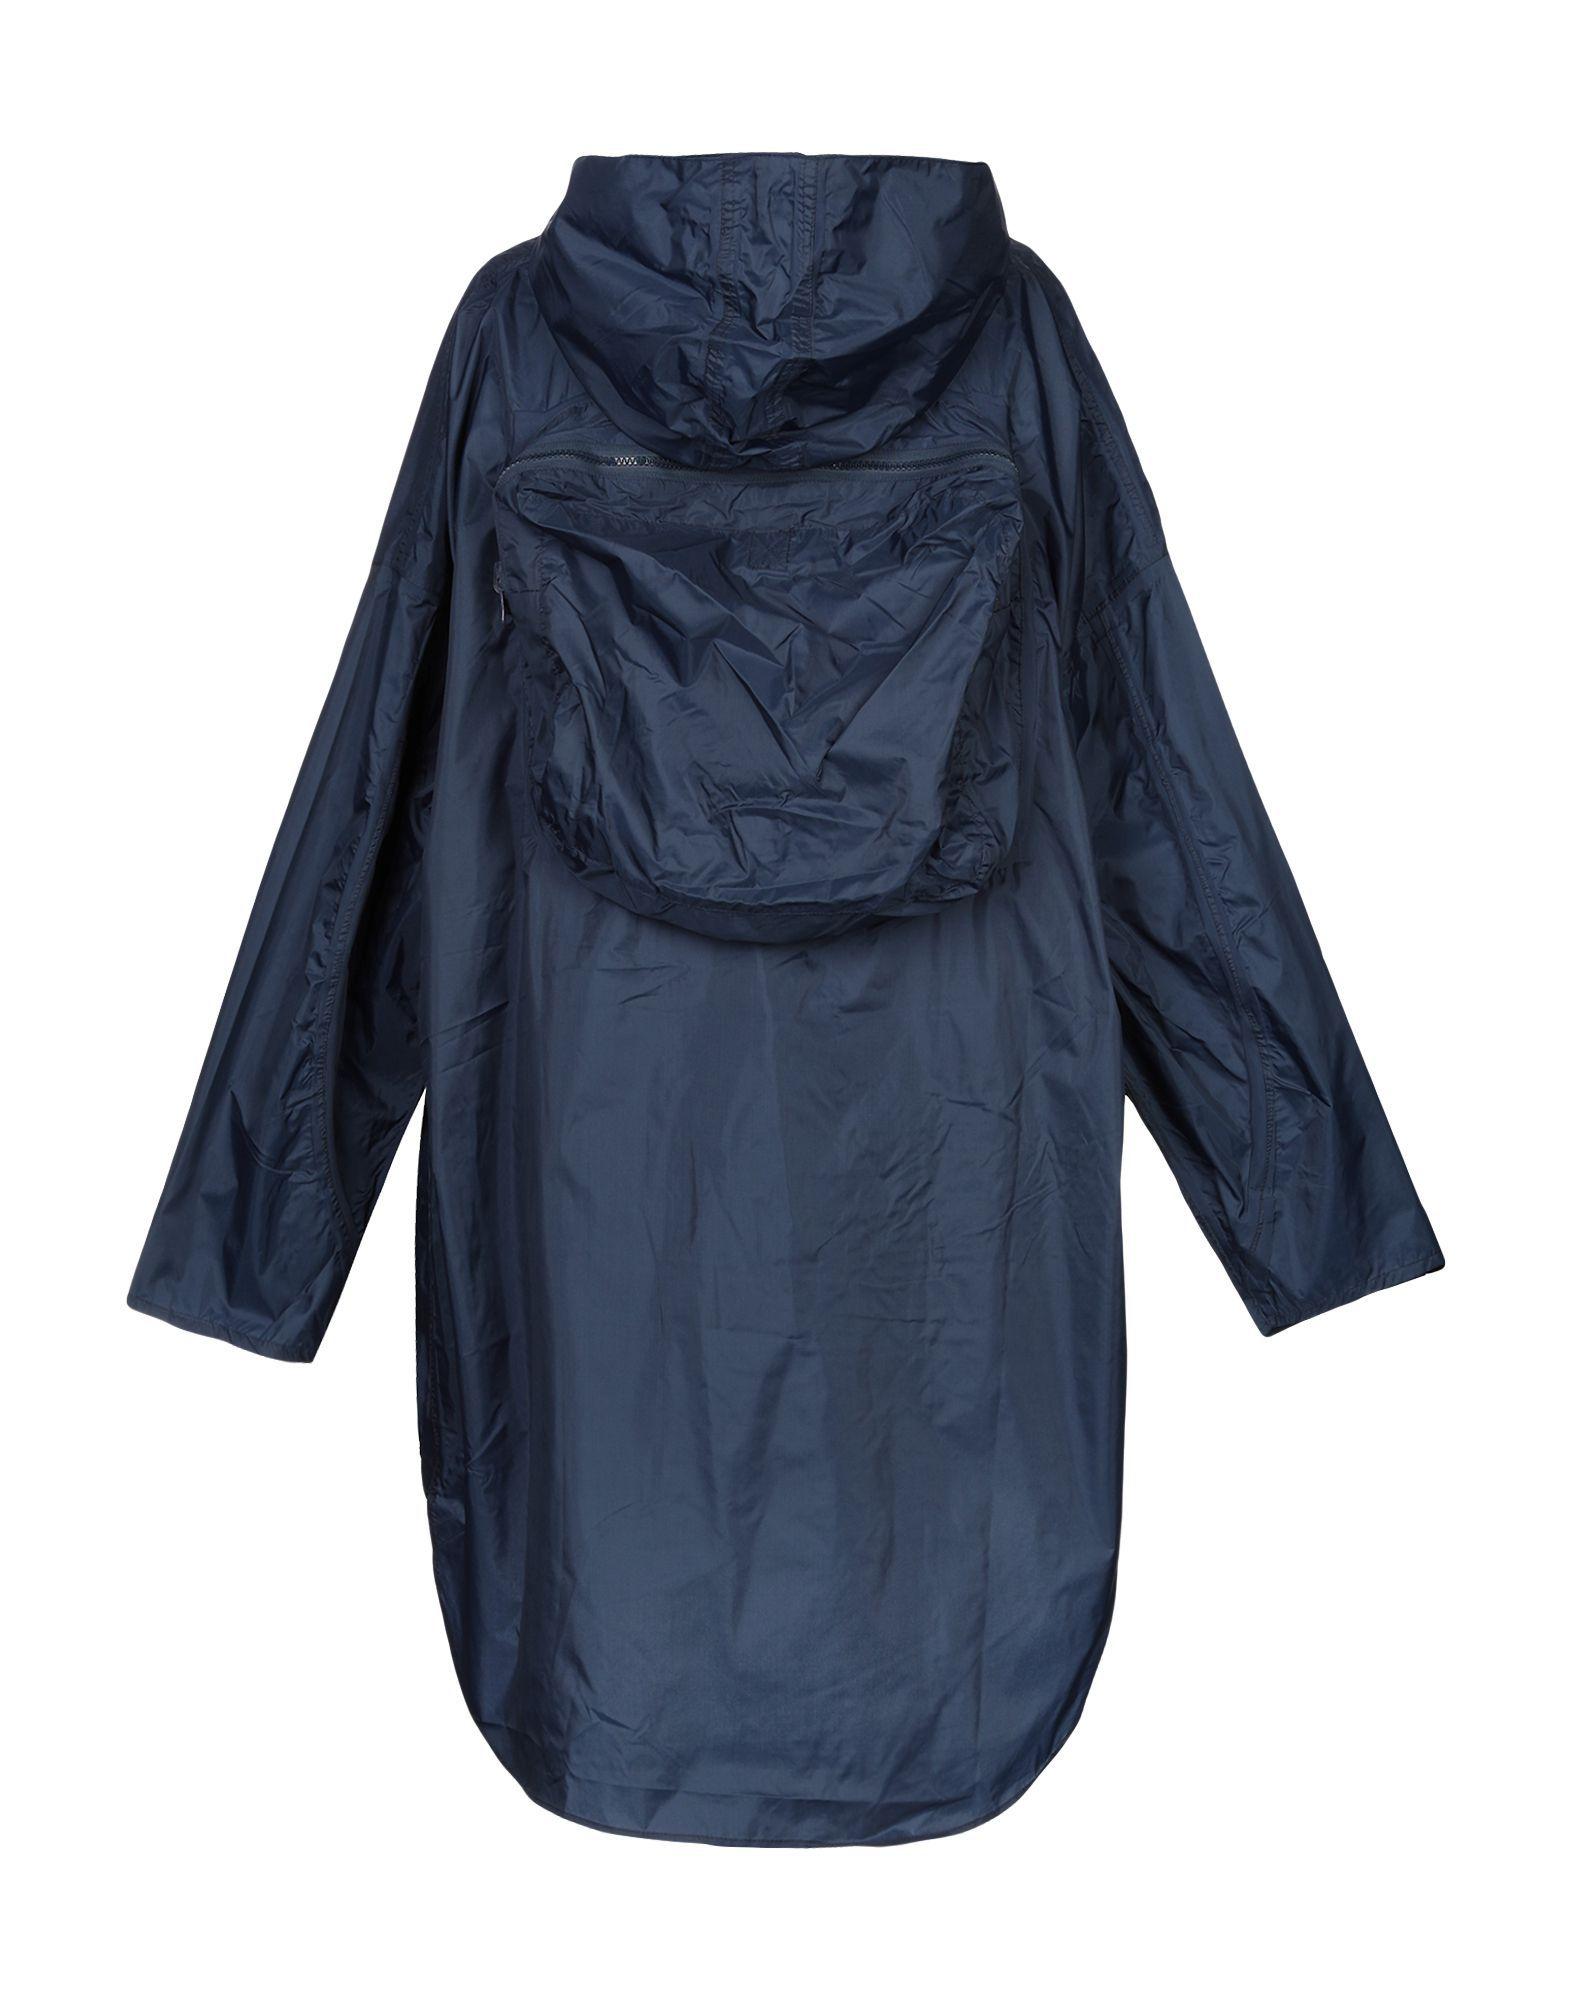 Aspesi Dark Blue Techno Fabric Raincoat